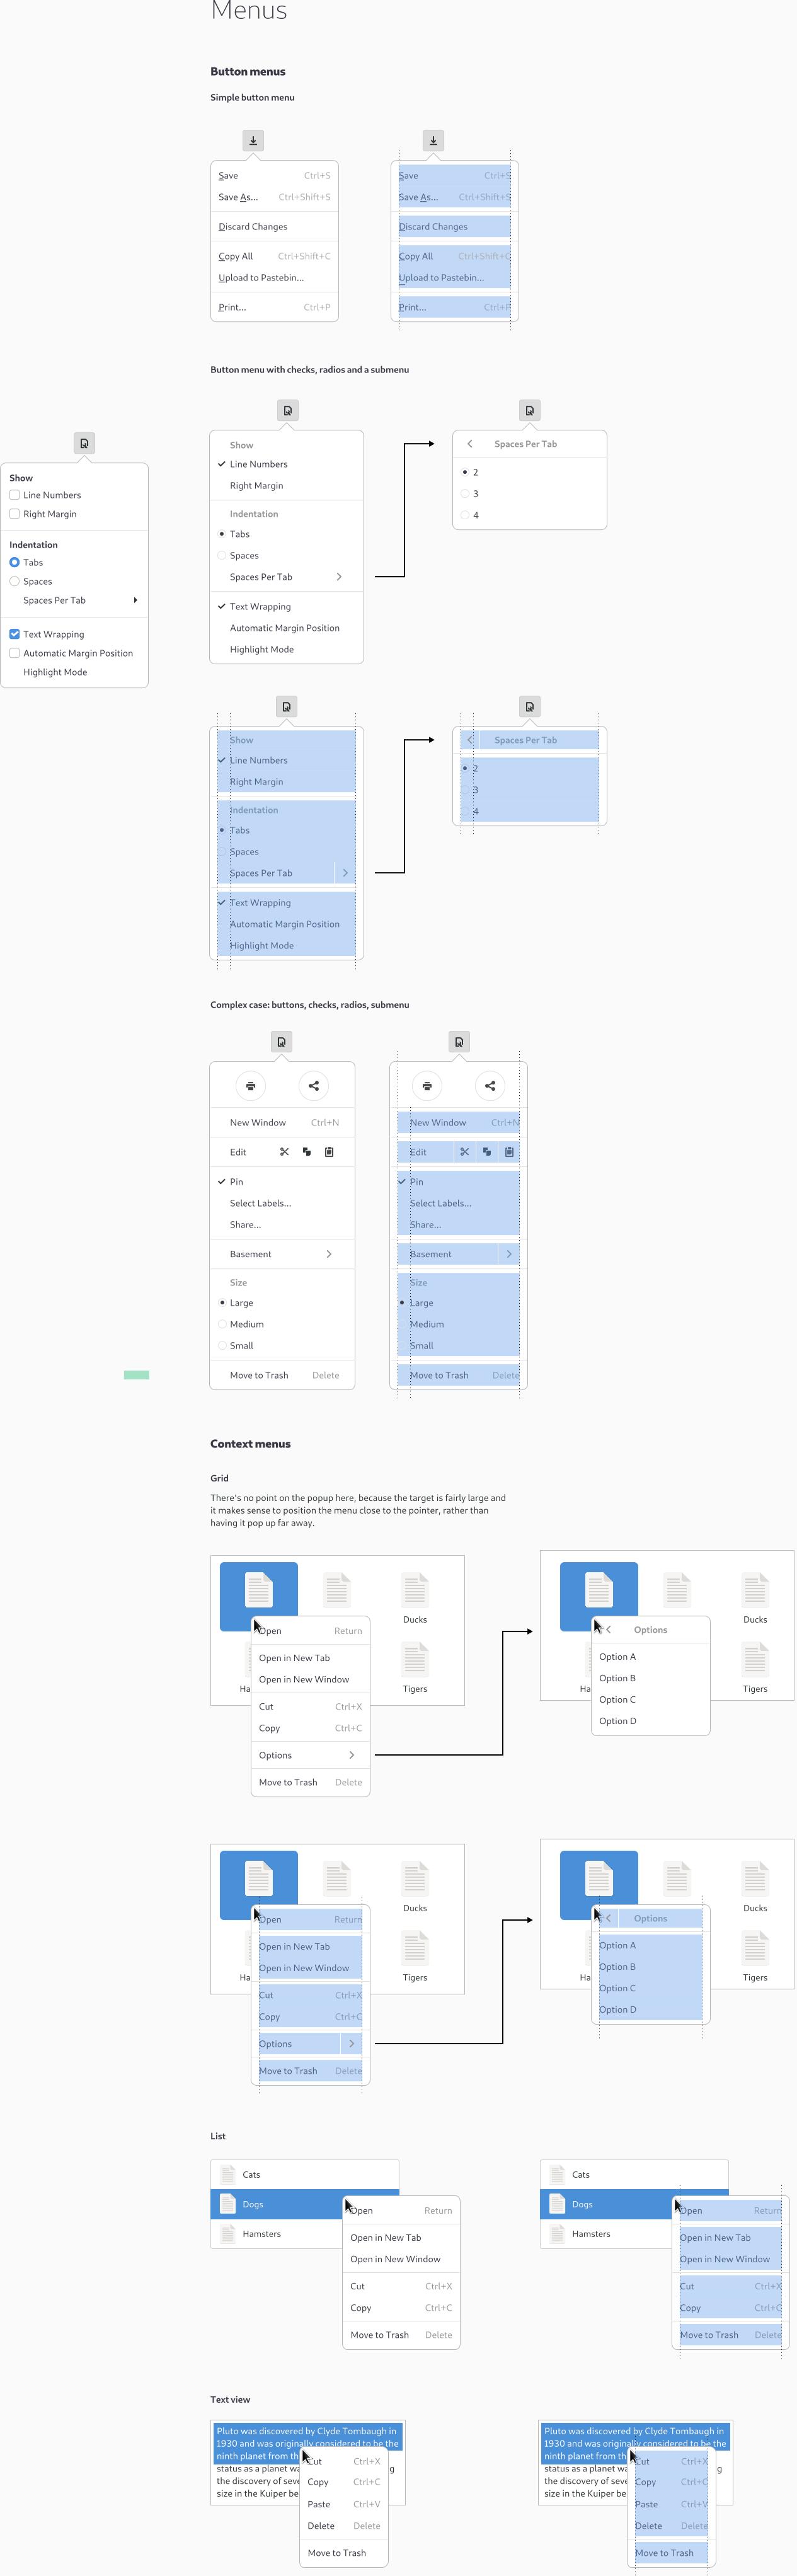 menus/menu-design-patterns.png